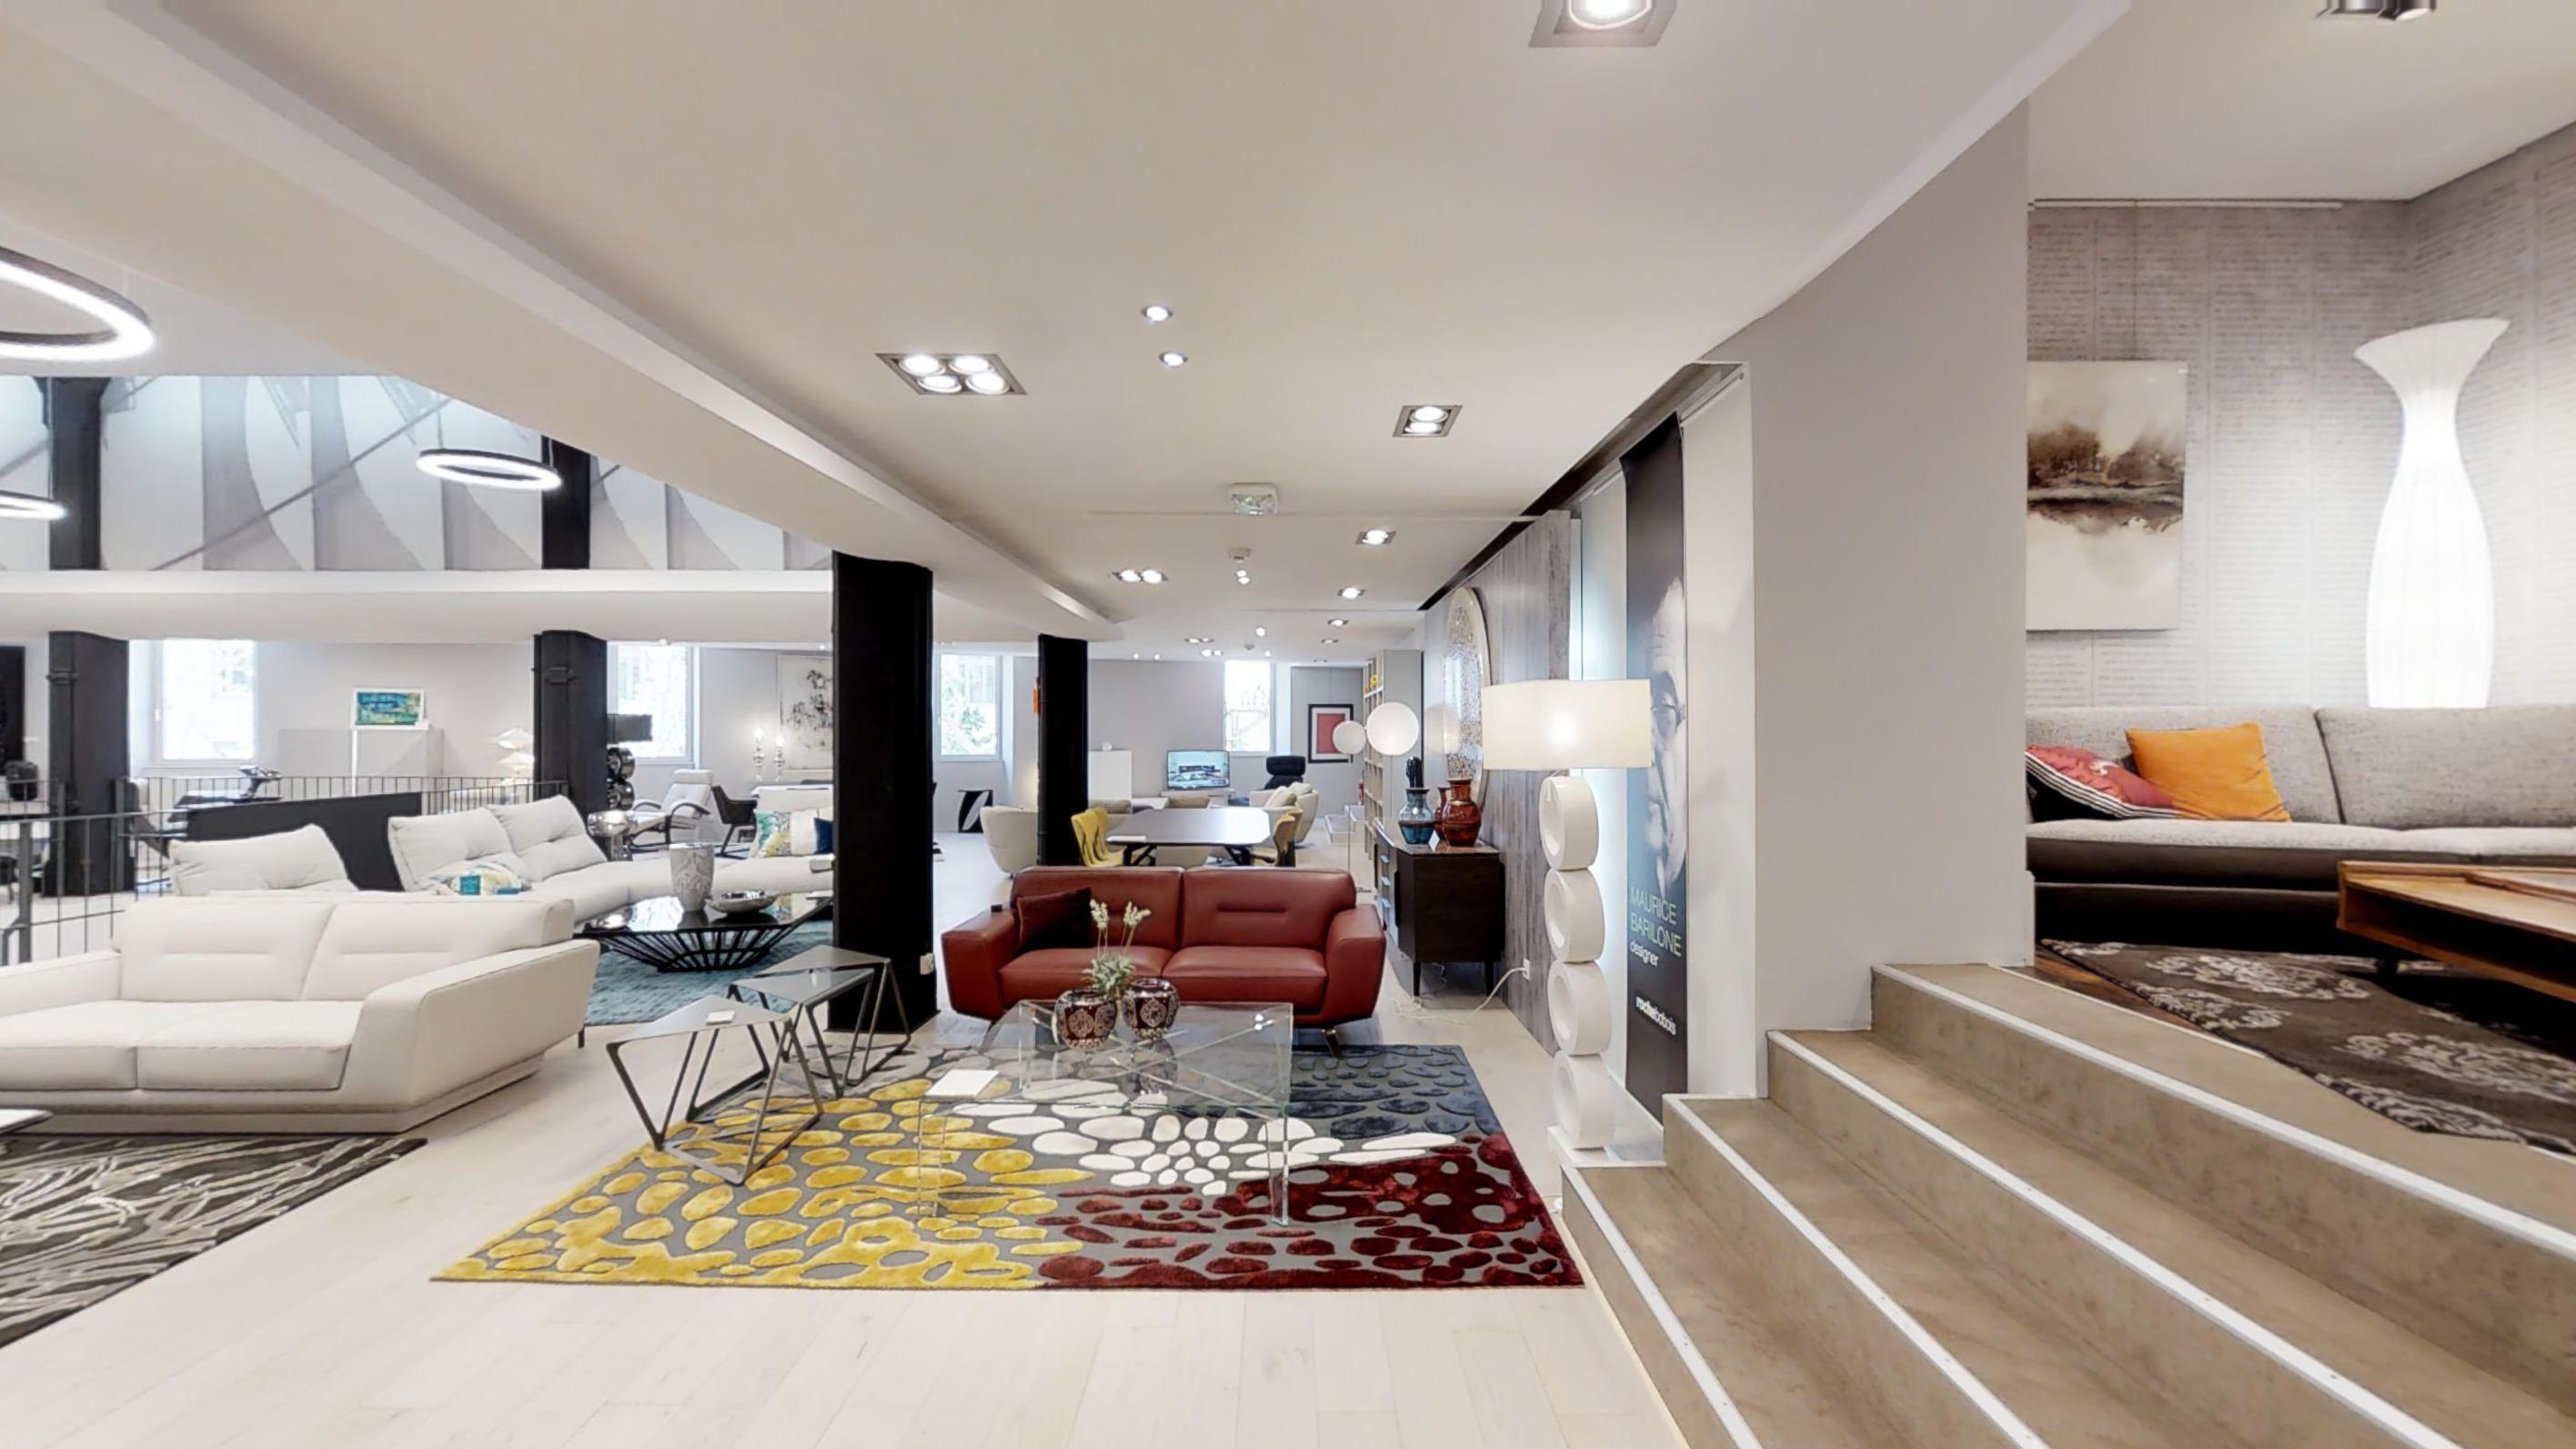 Magasin Decoration Interieur Valence